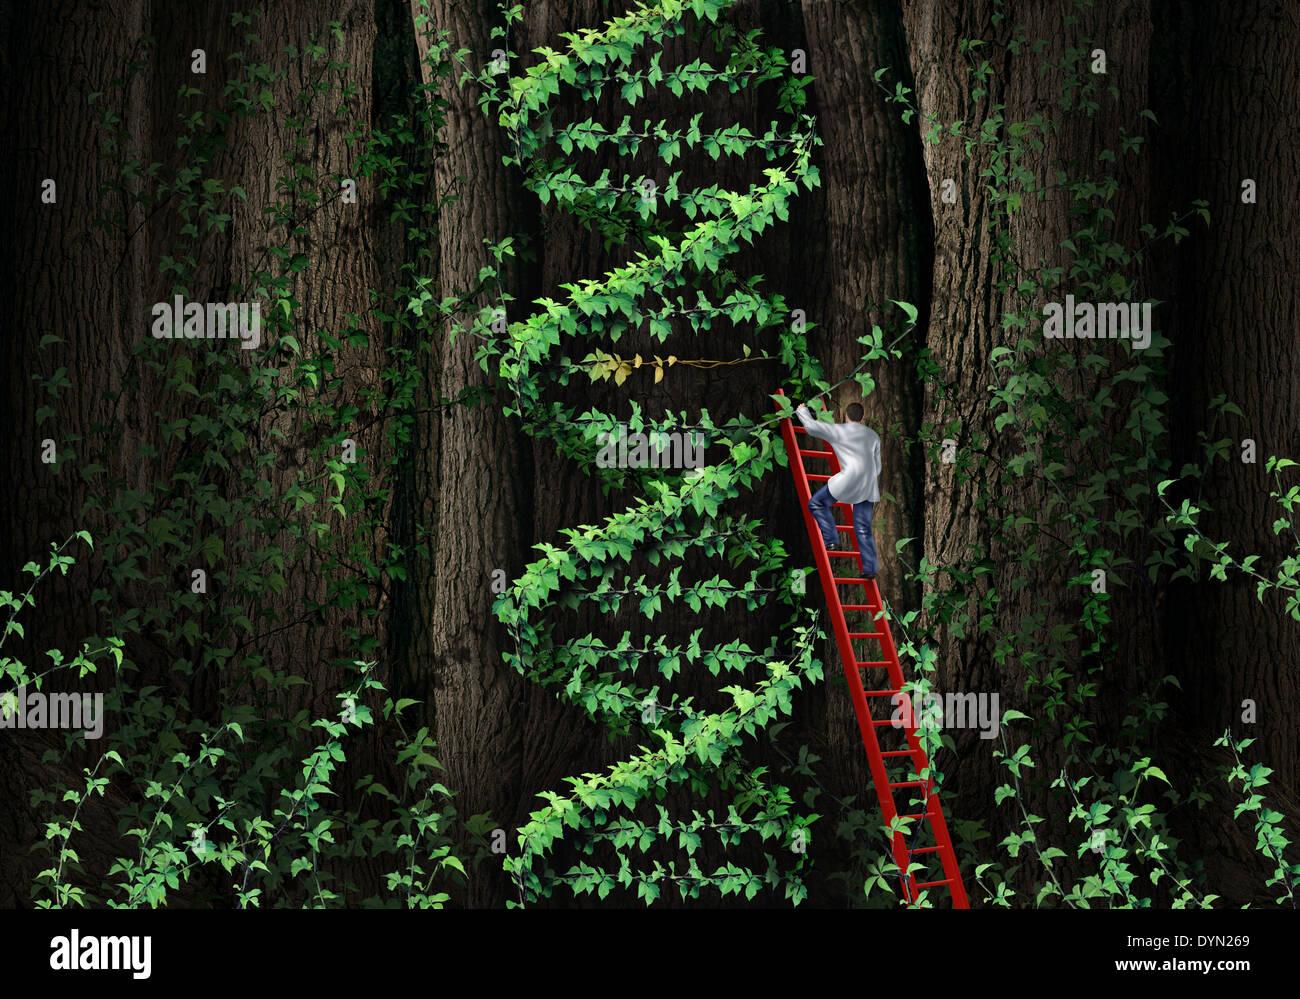 Hélice de ADN el concepto de terapia génica con un médico ...